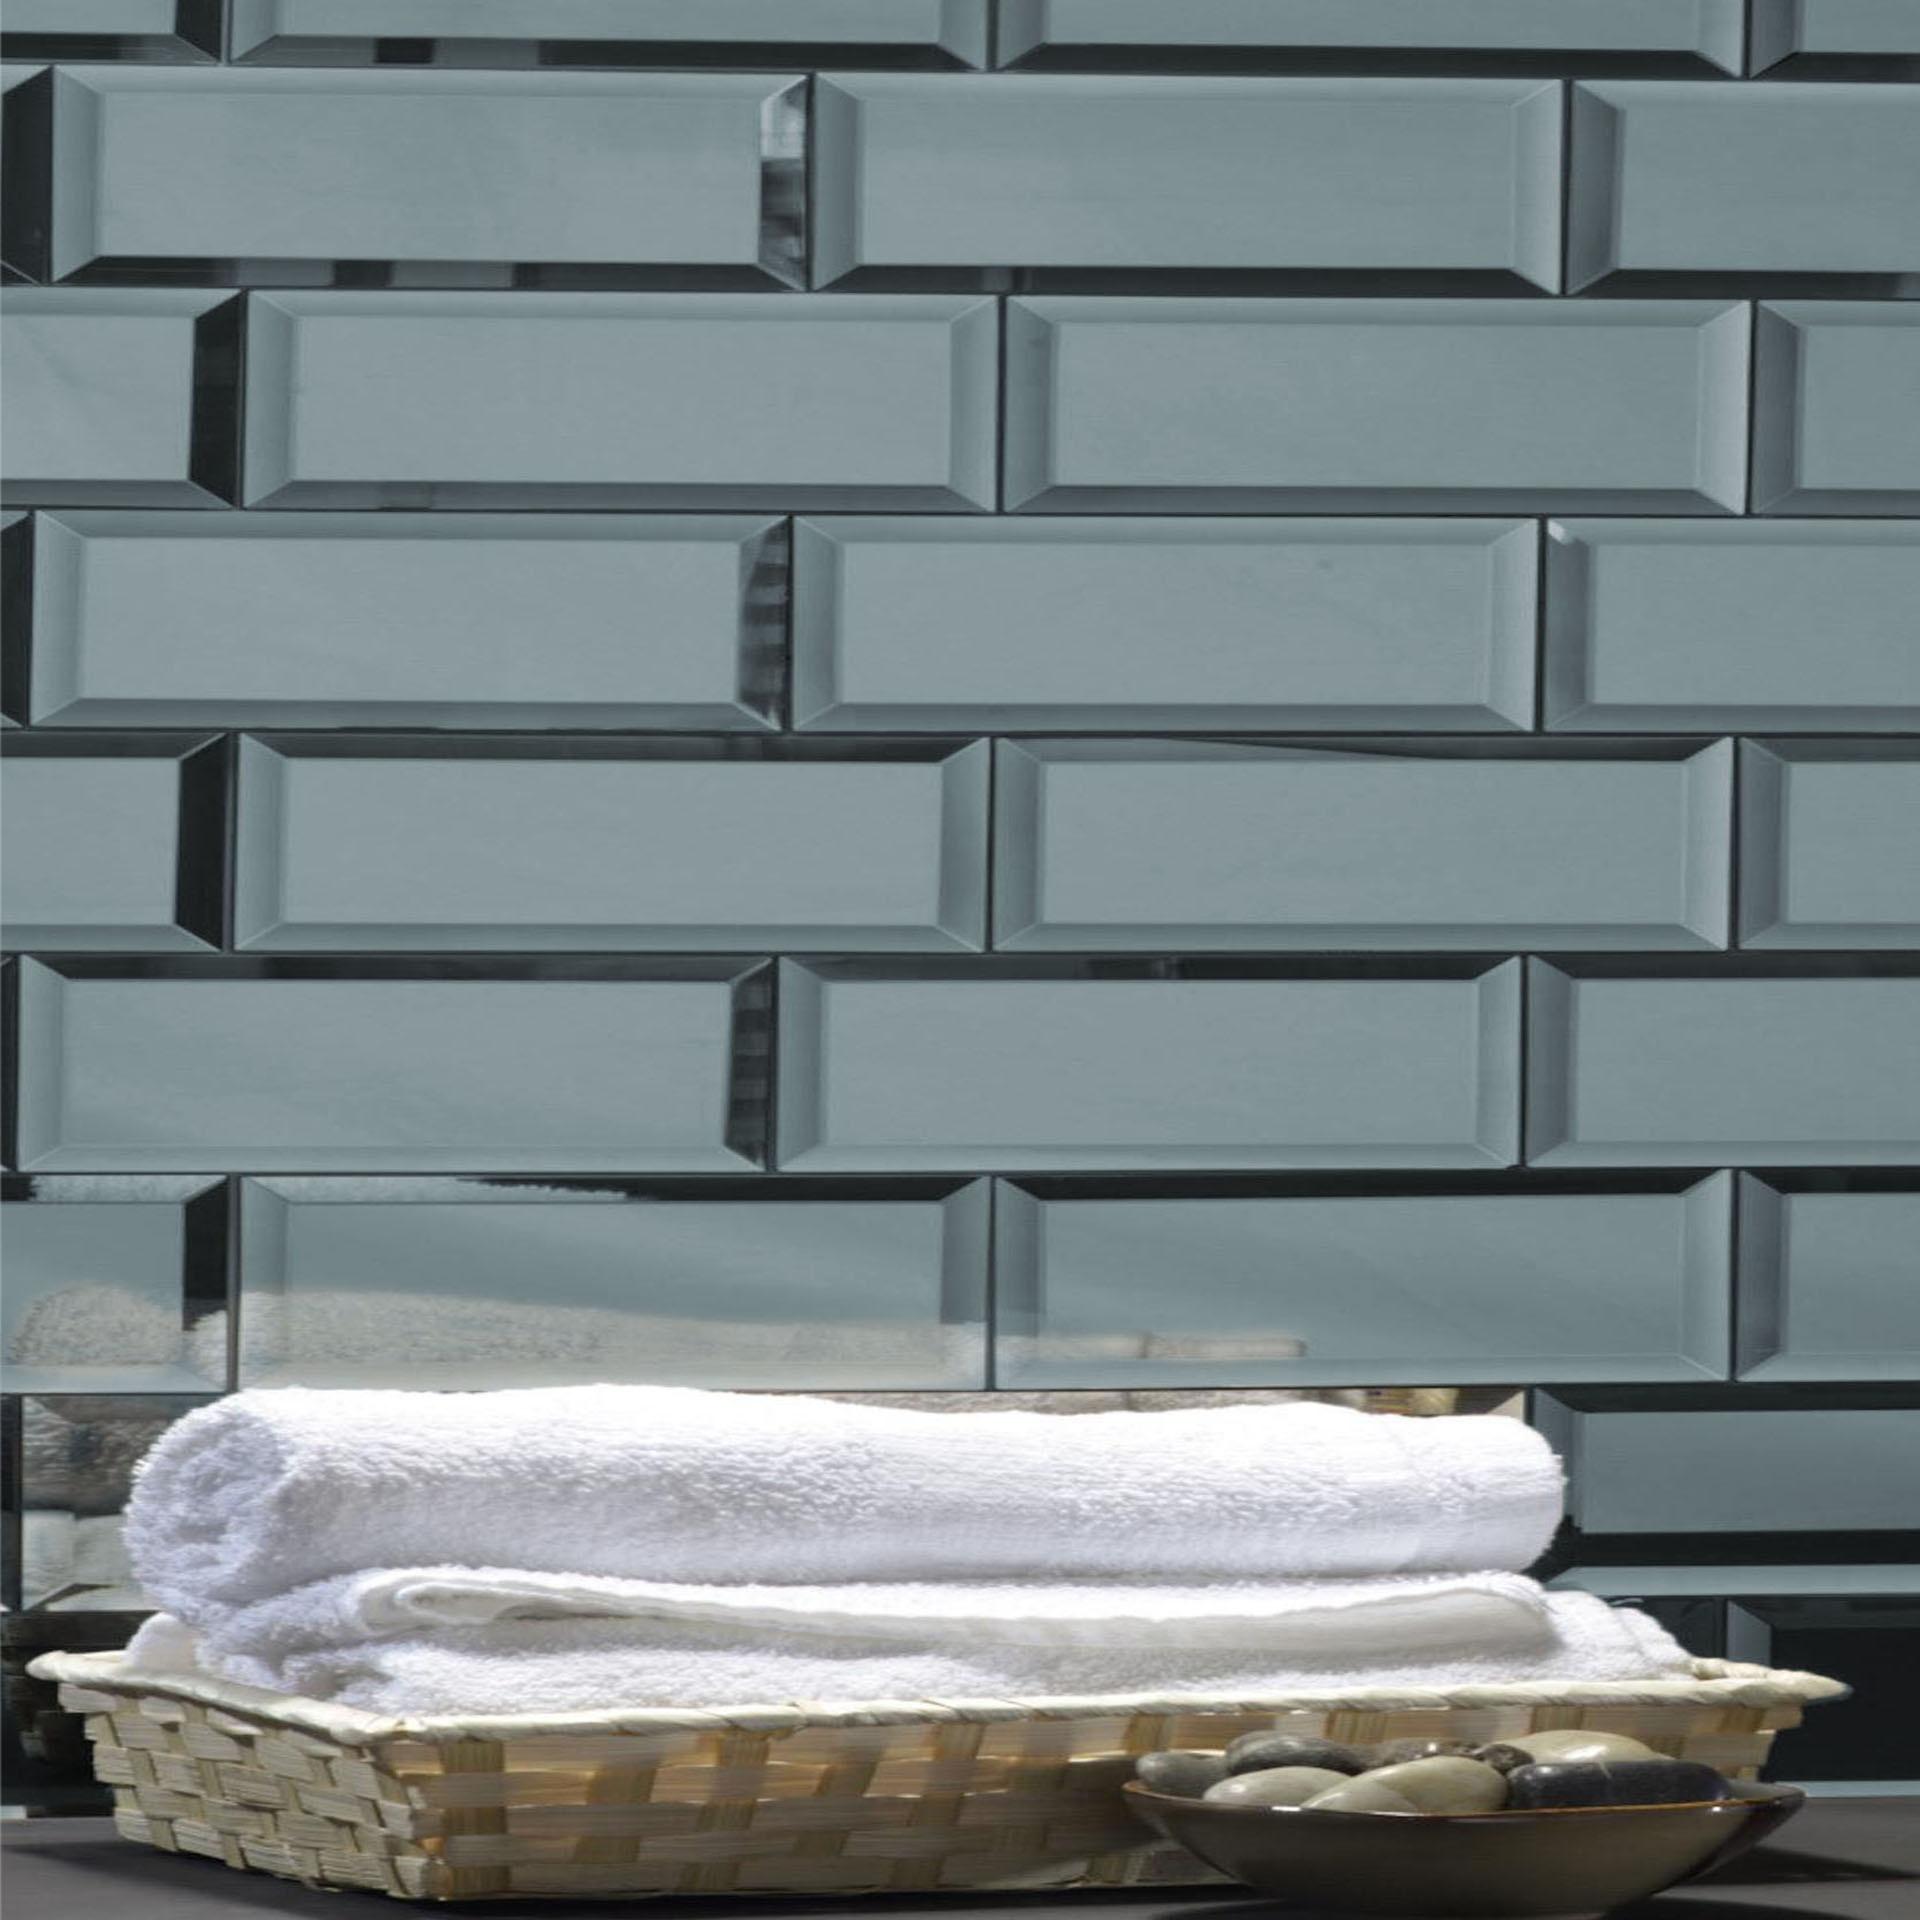 "Reflections 3"" x 12"" Glossy Gray Mirror Subway Backsplash Wall Tile"